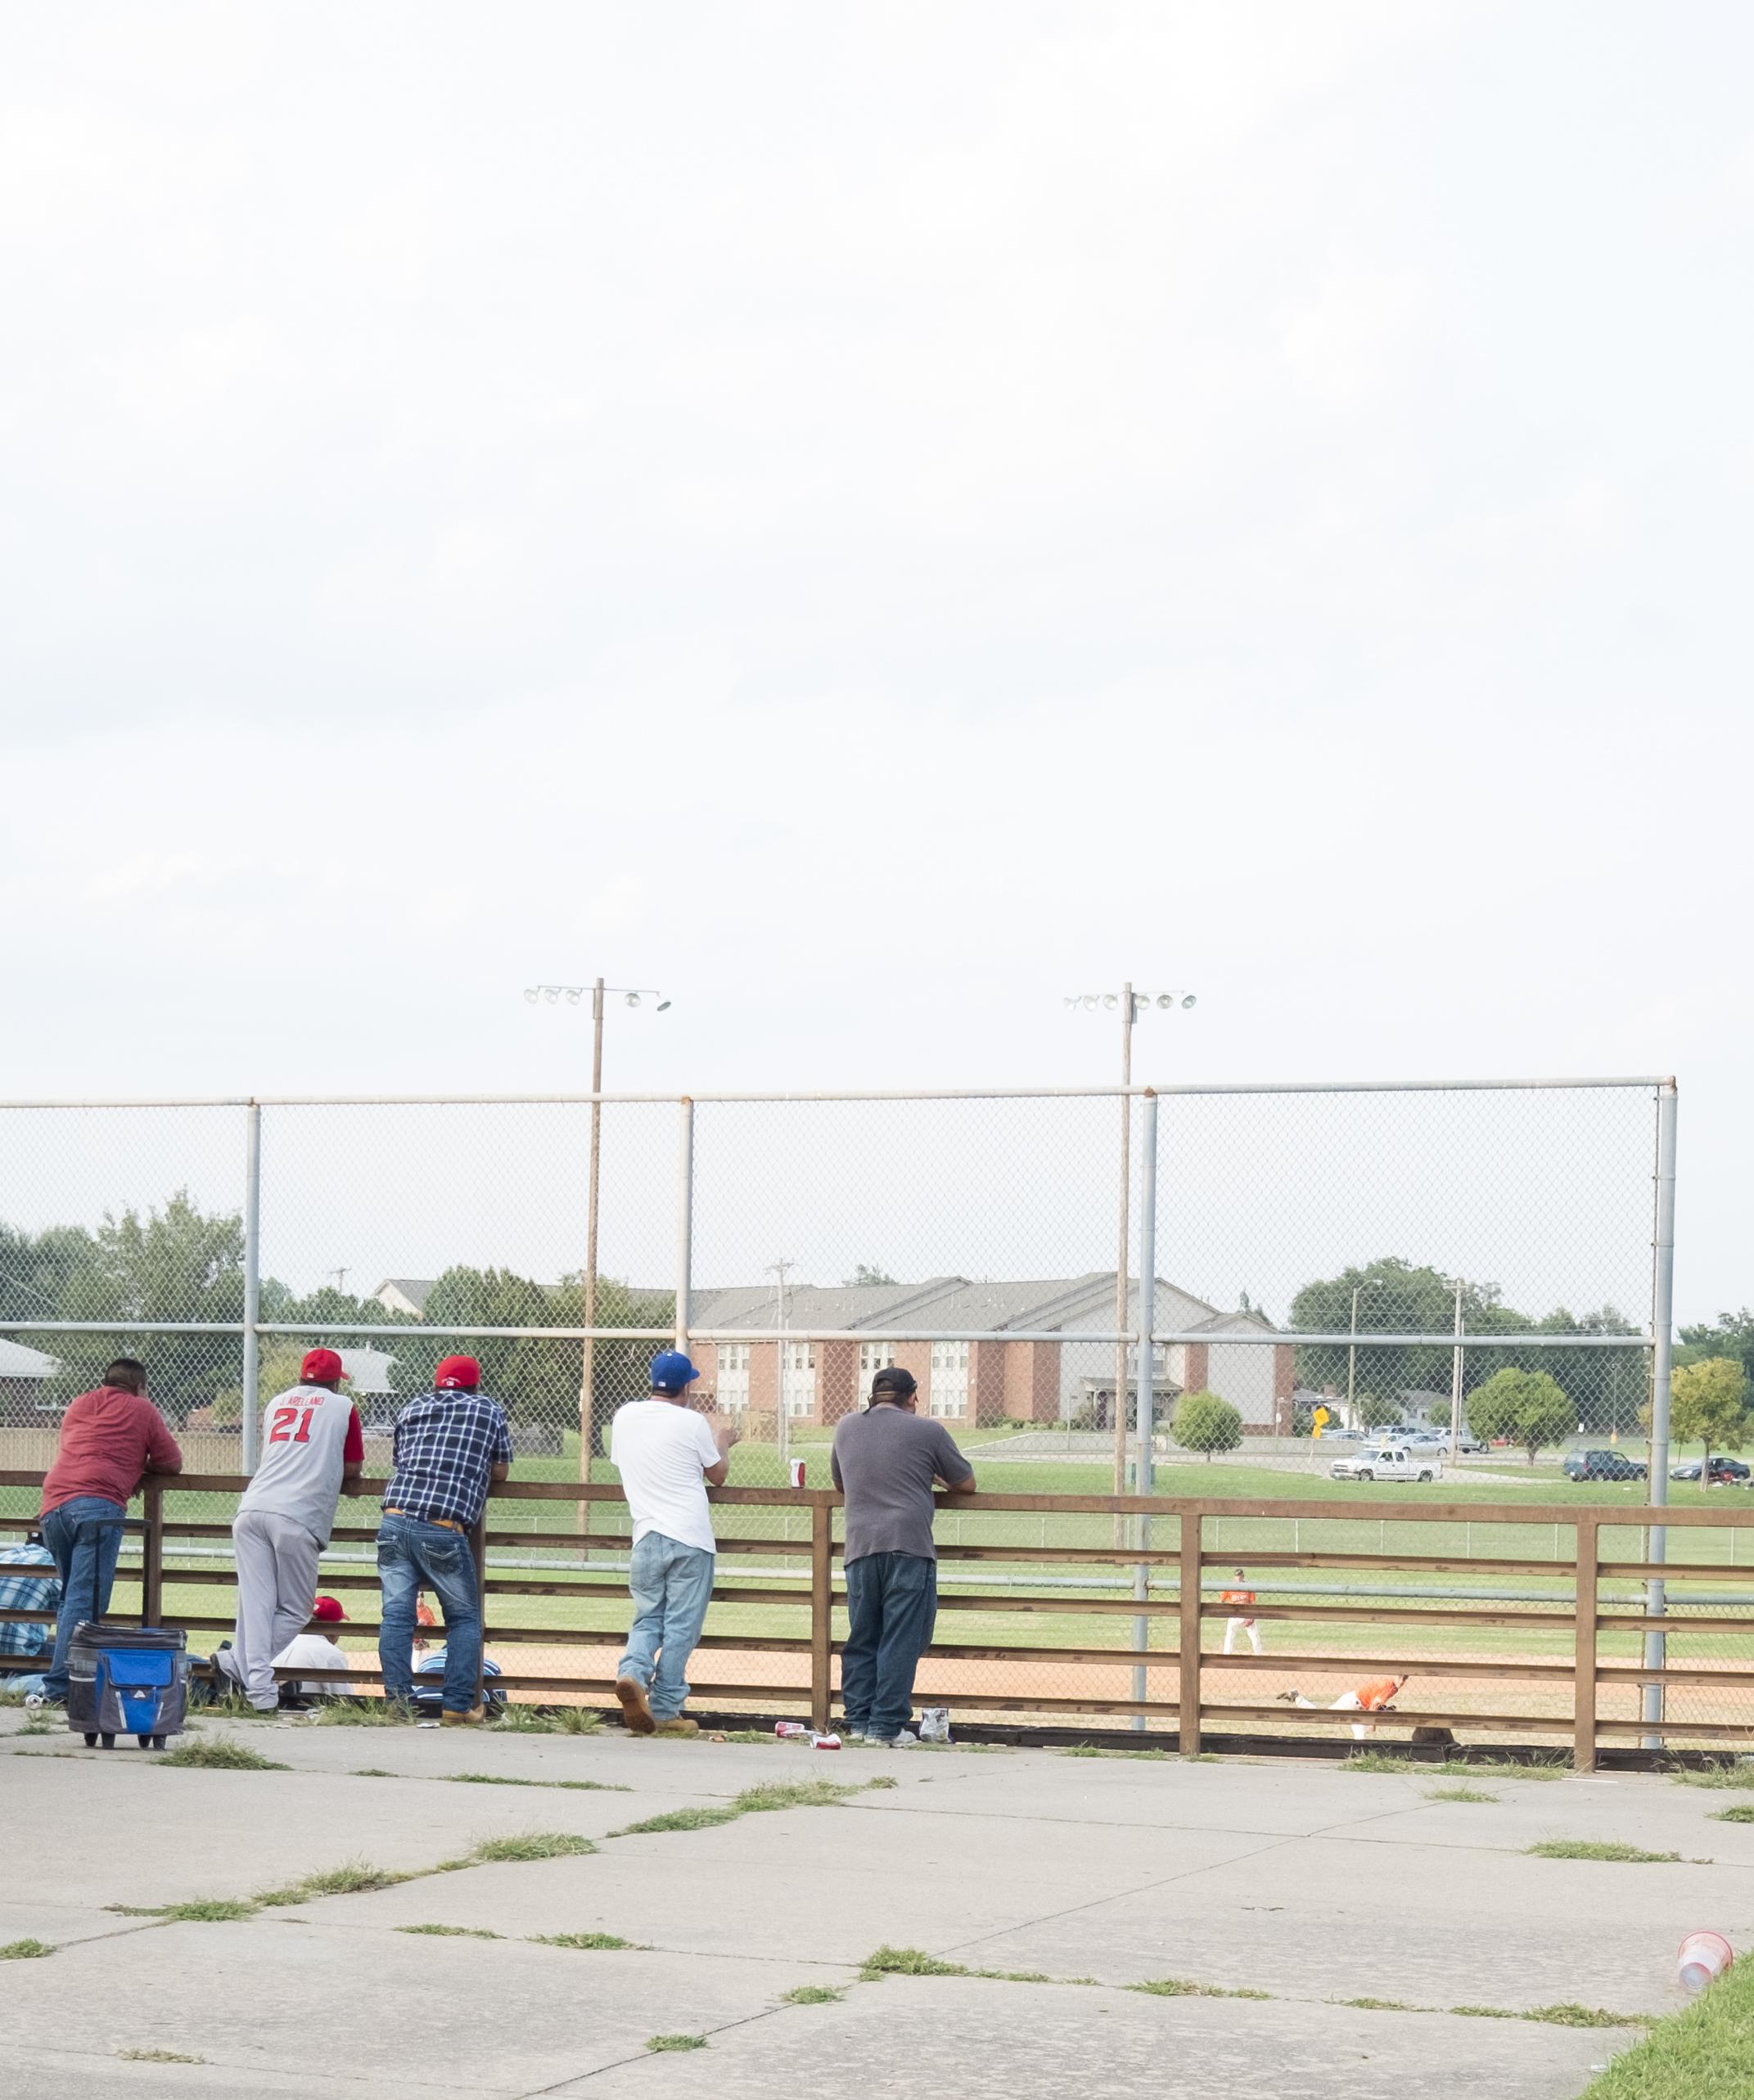 Dads watching kids play baseball